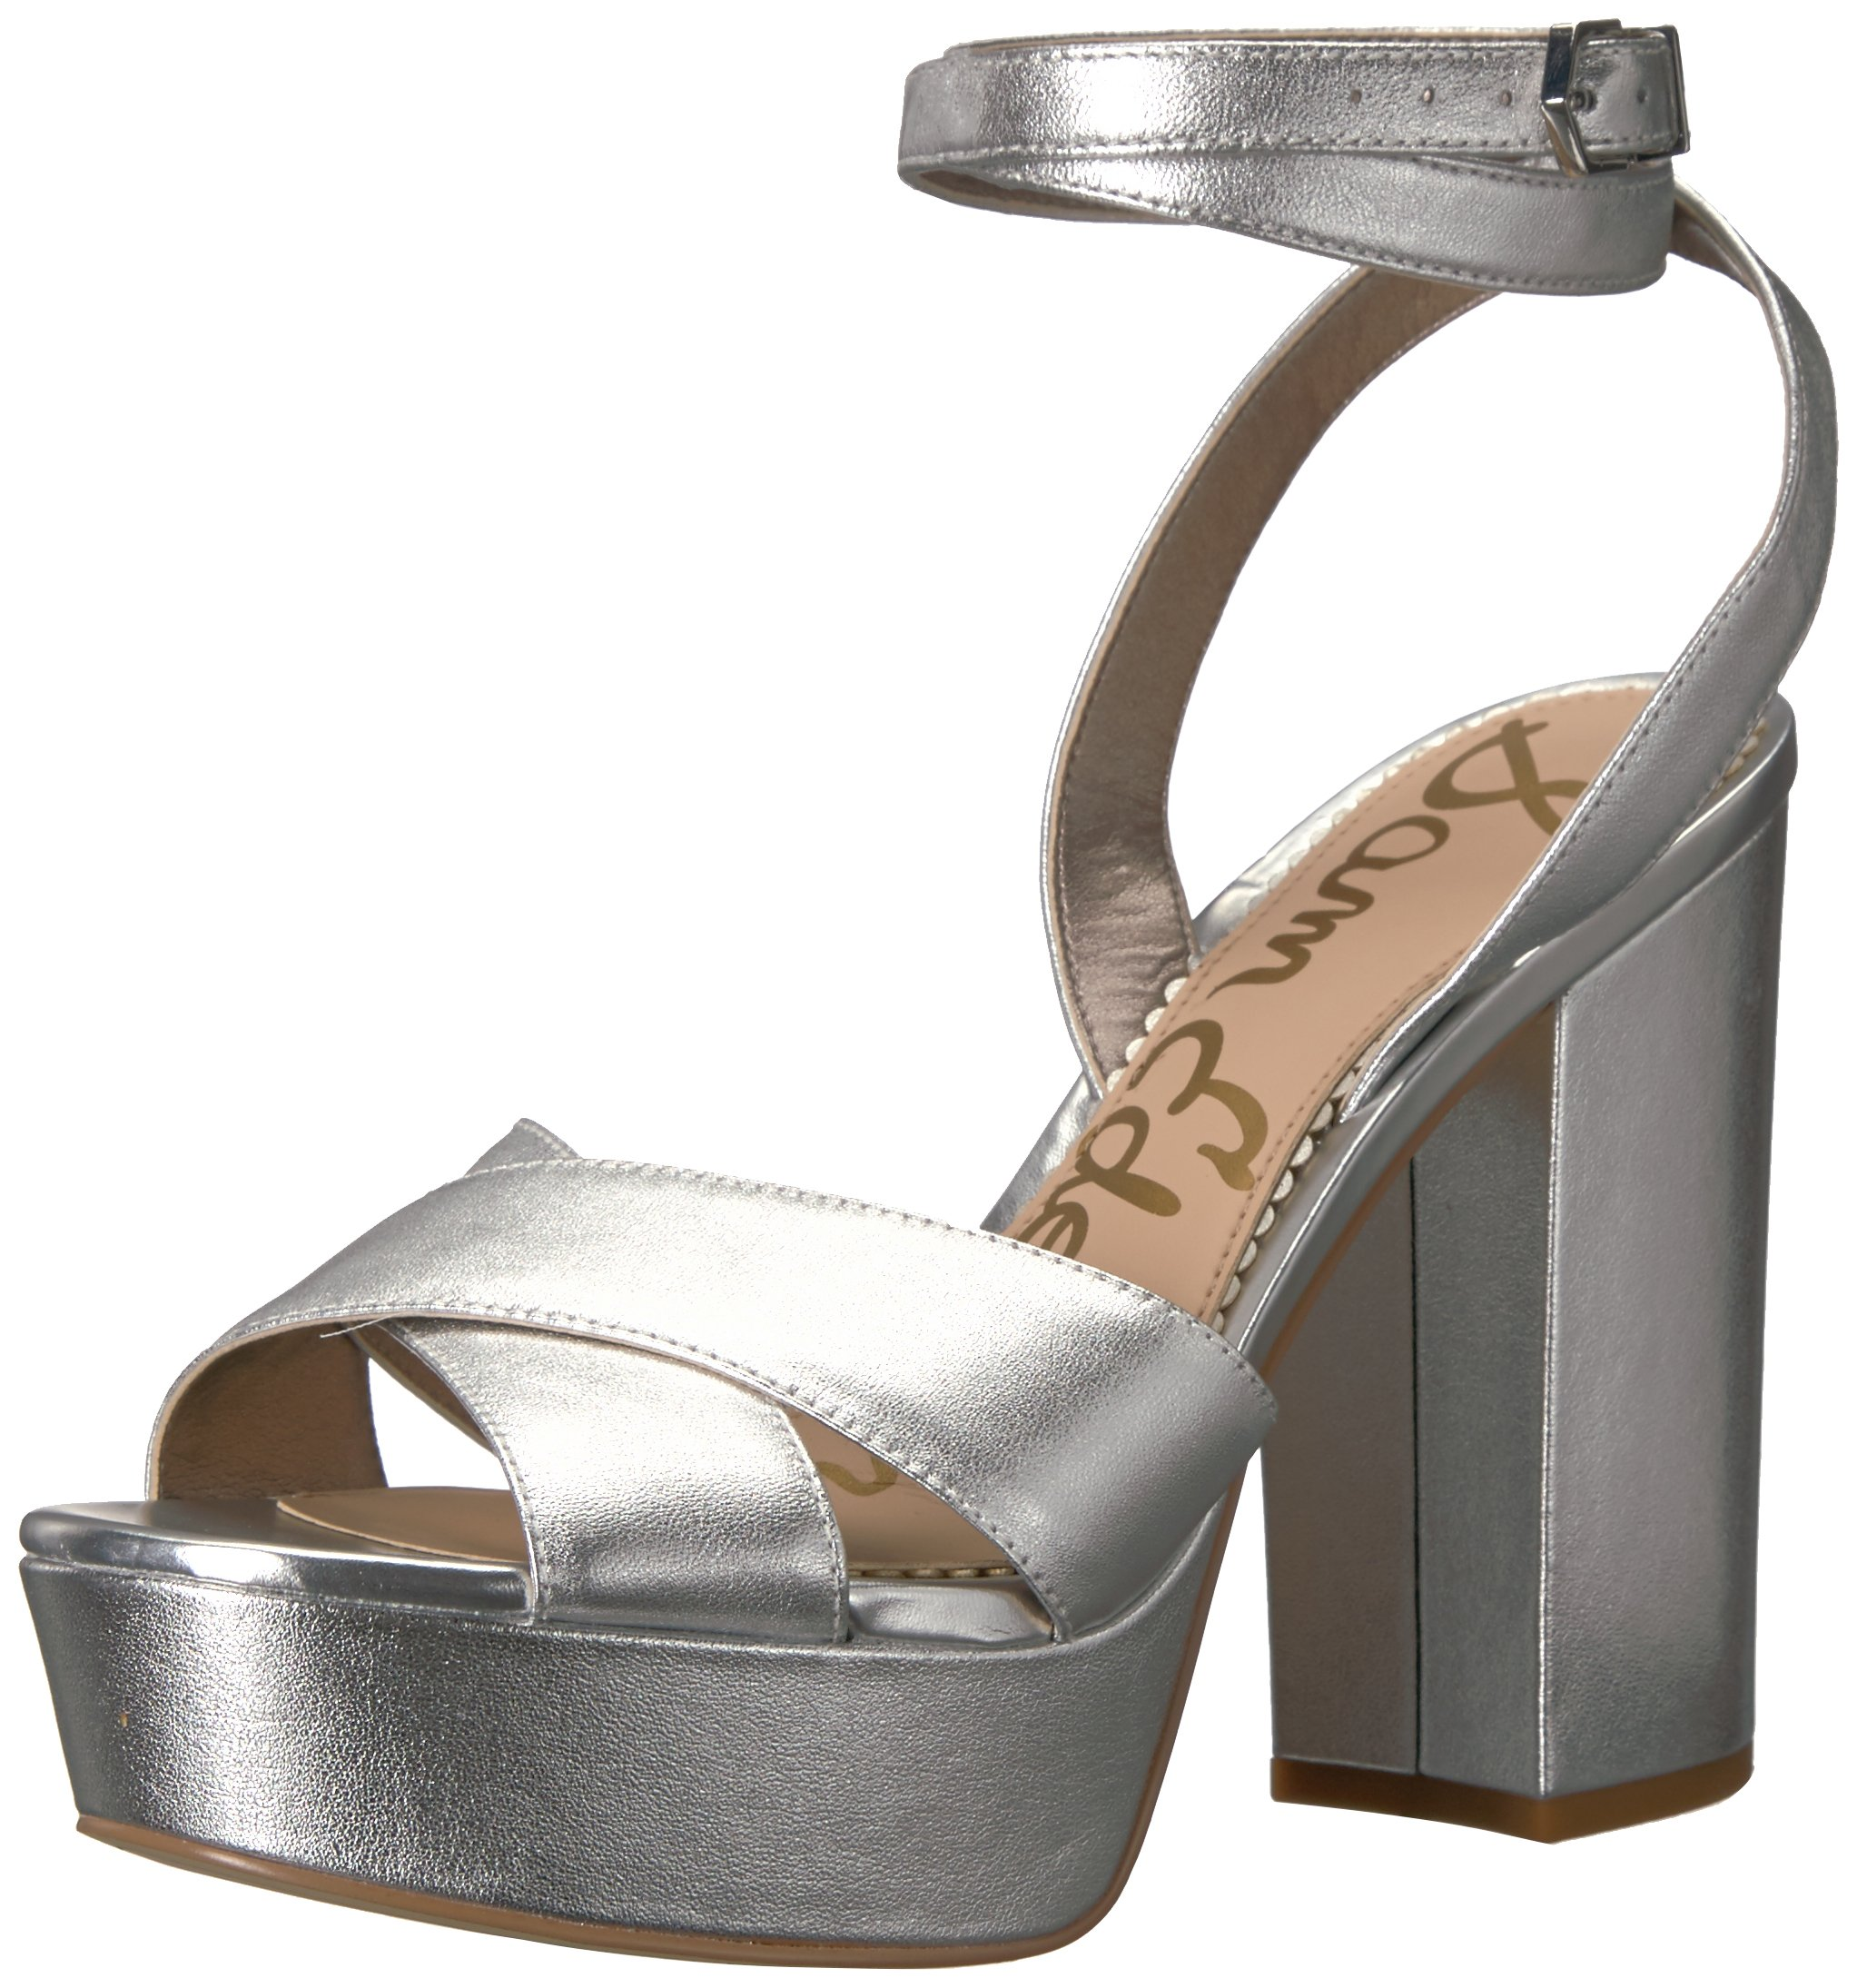 Sam Edelman Women's Mara Heeled Sandal, Soft Silver/Metallic Leather, 6.5 Medium US